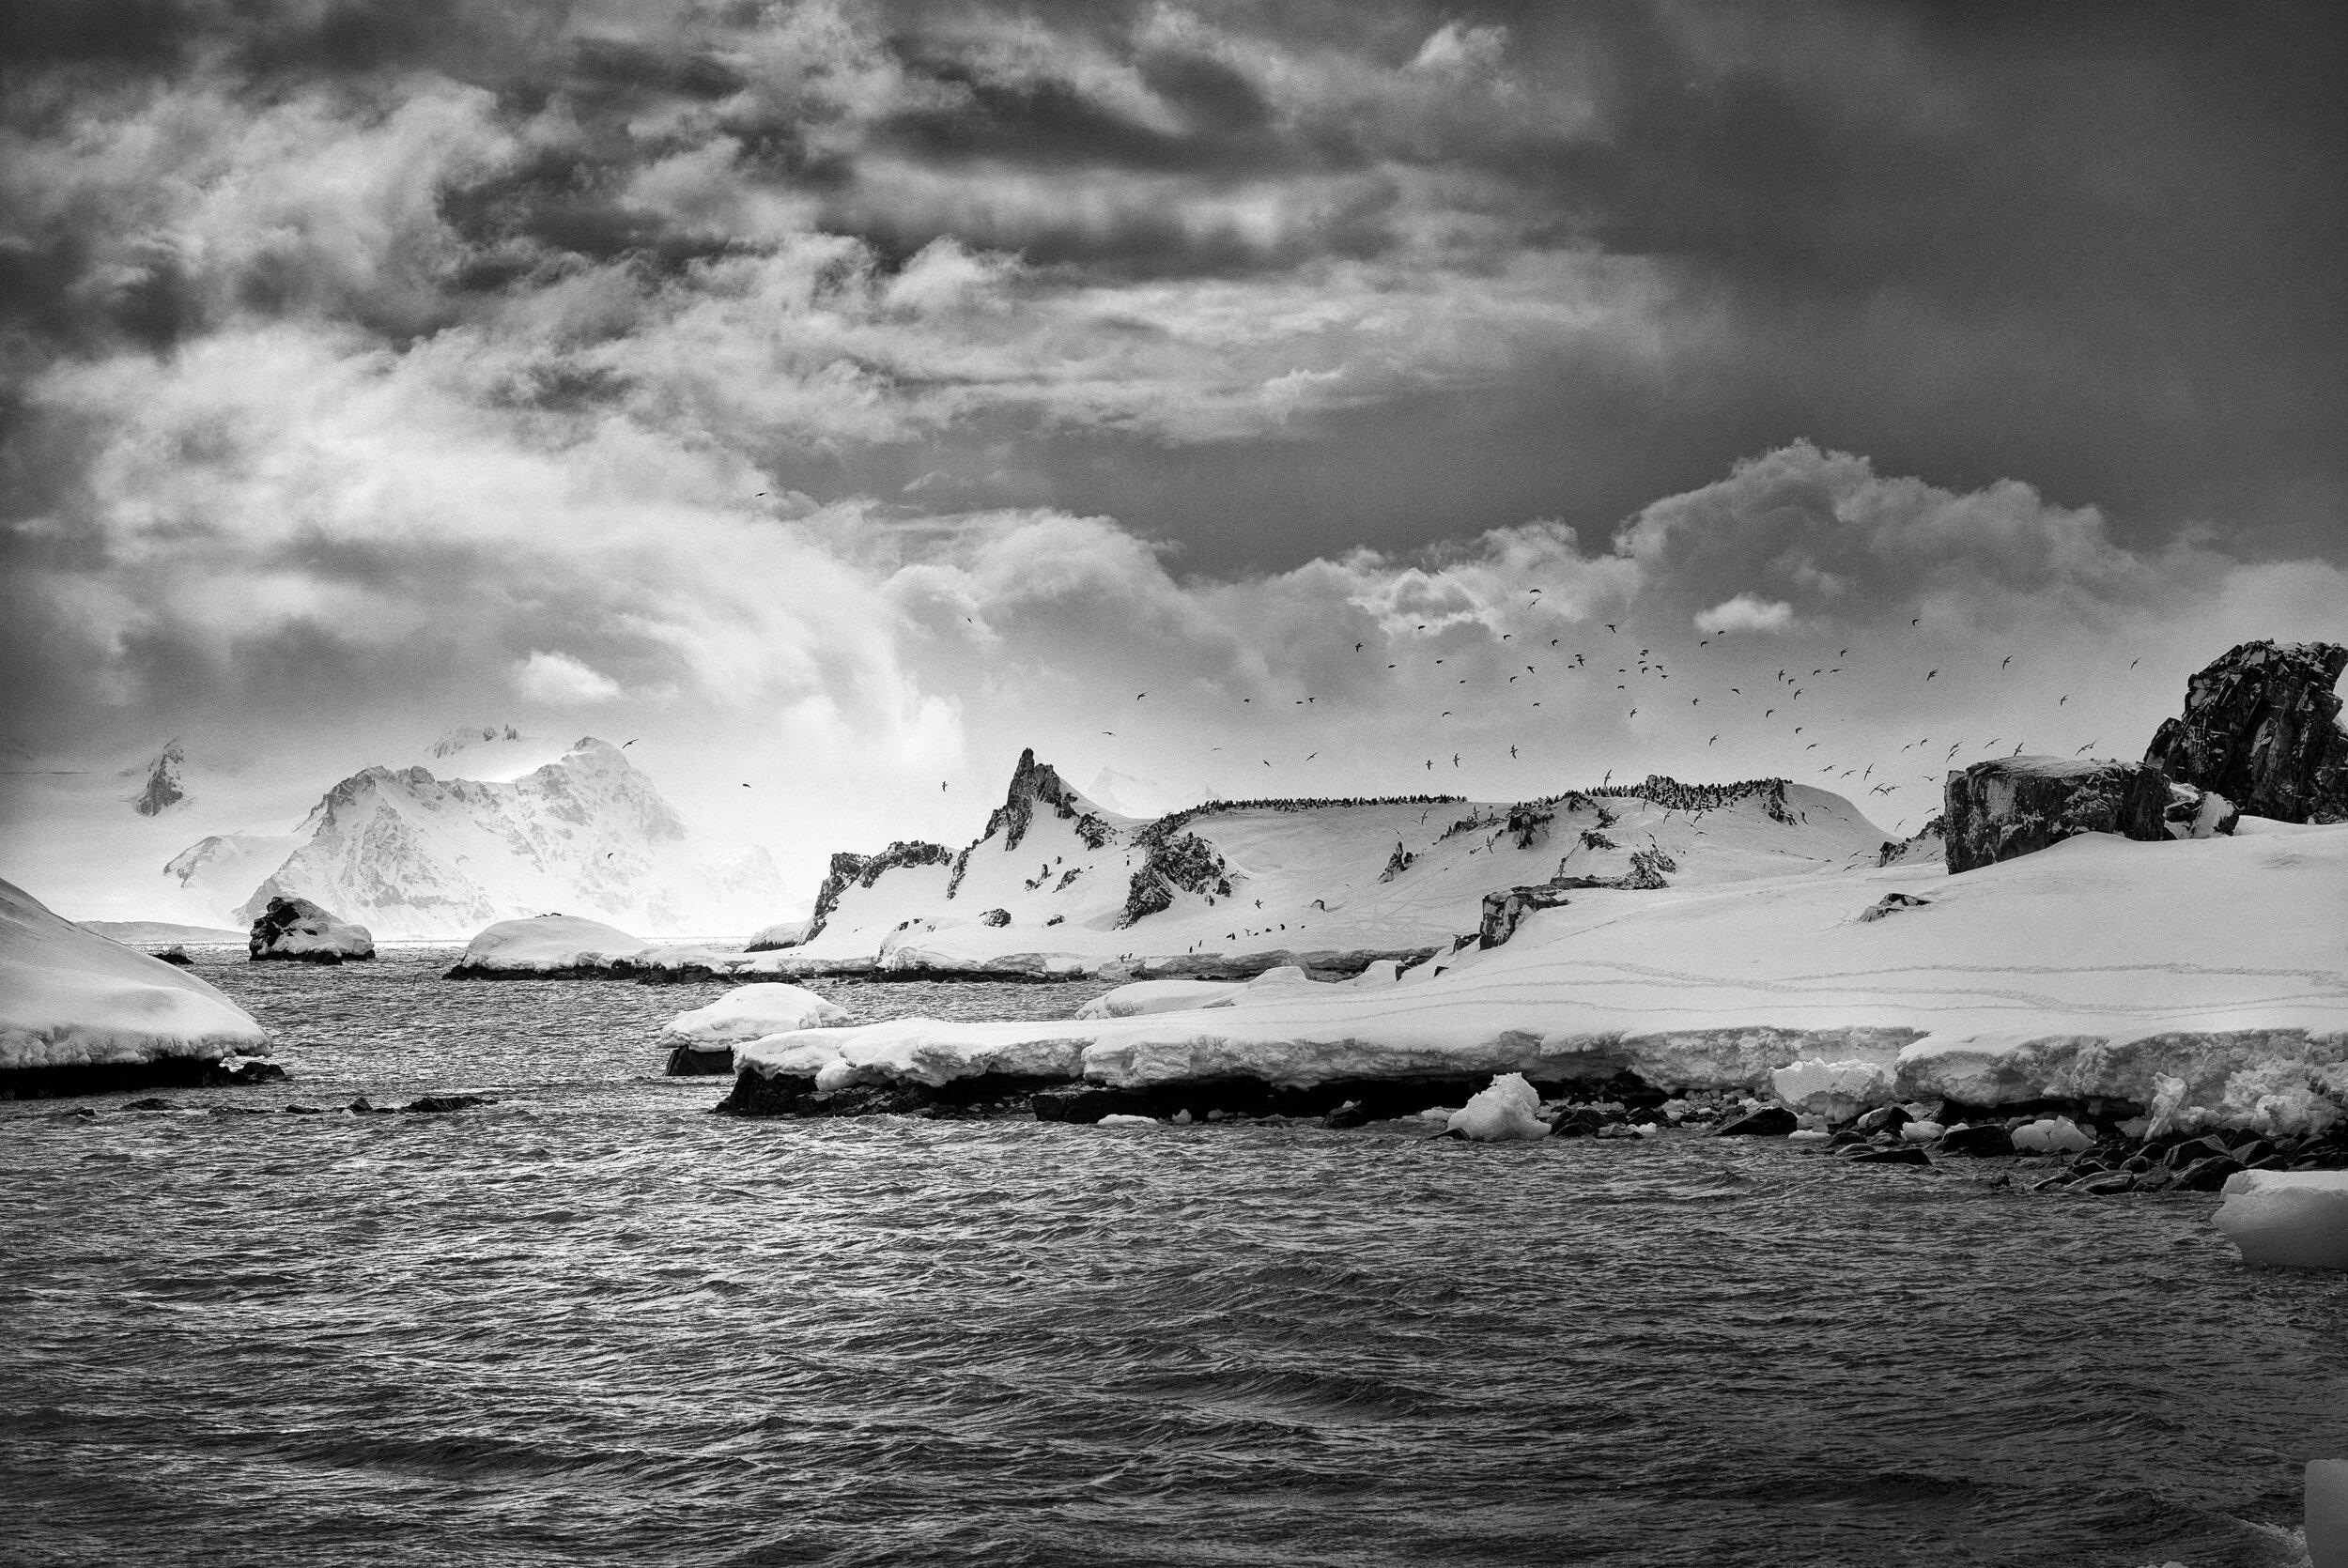 manuel_uebler_antarctica_bw_019.jpg